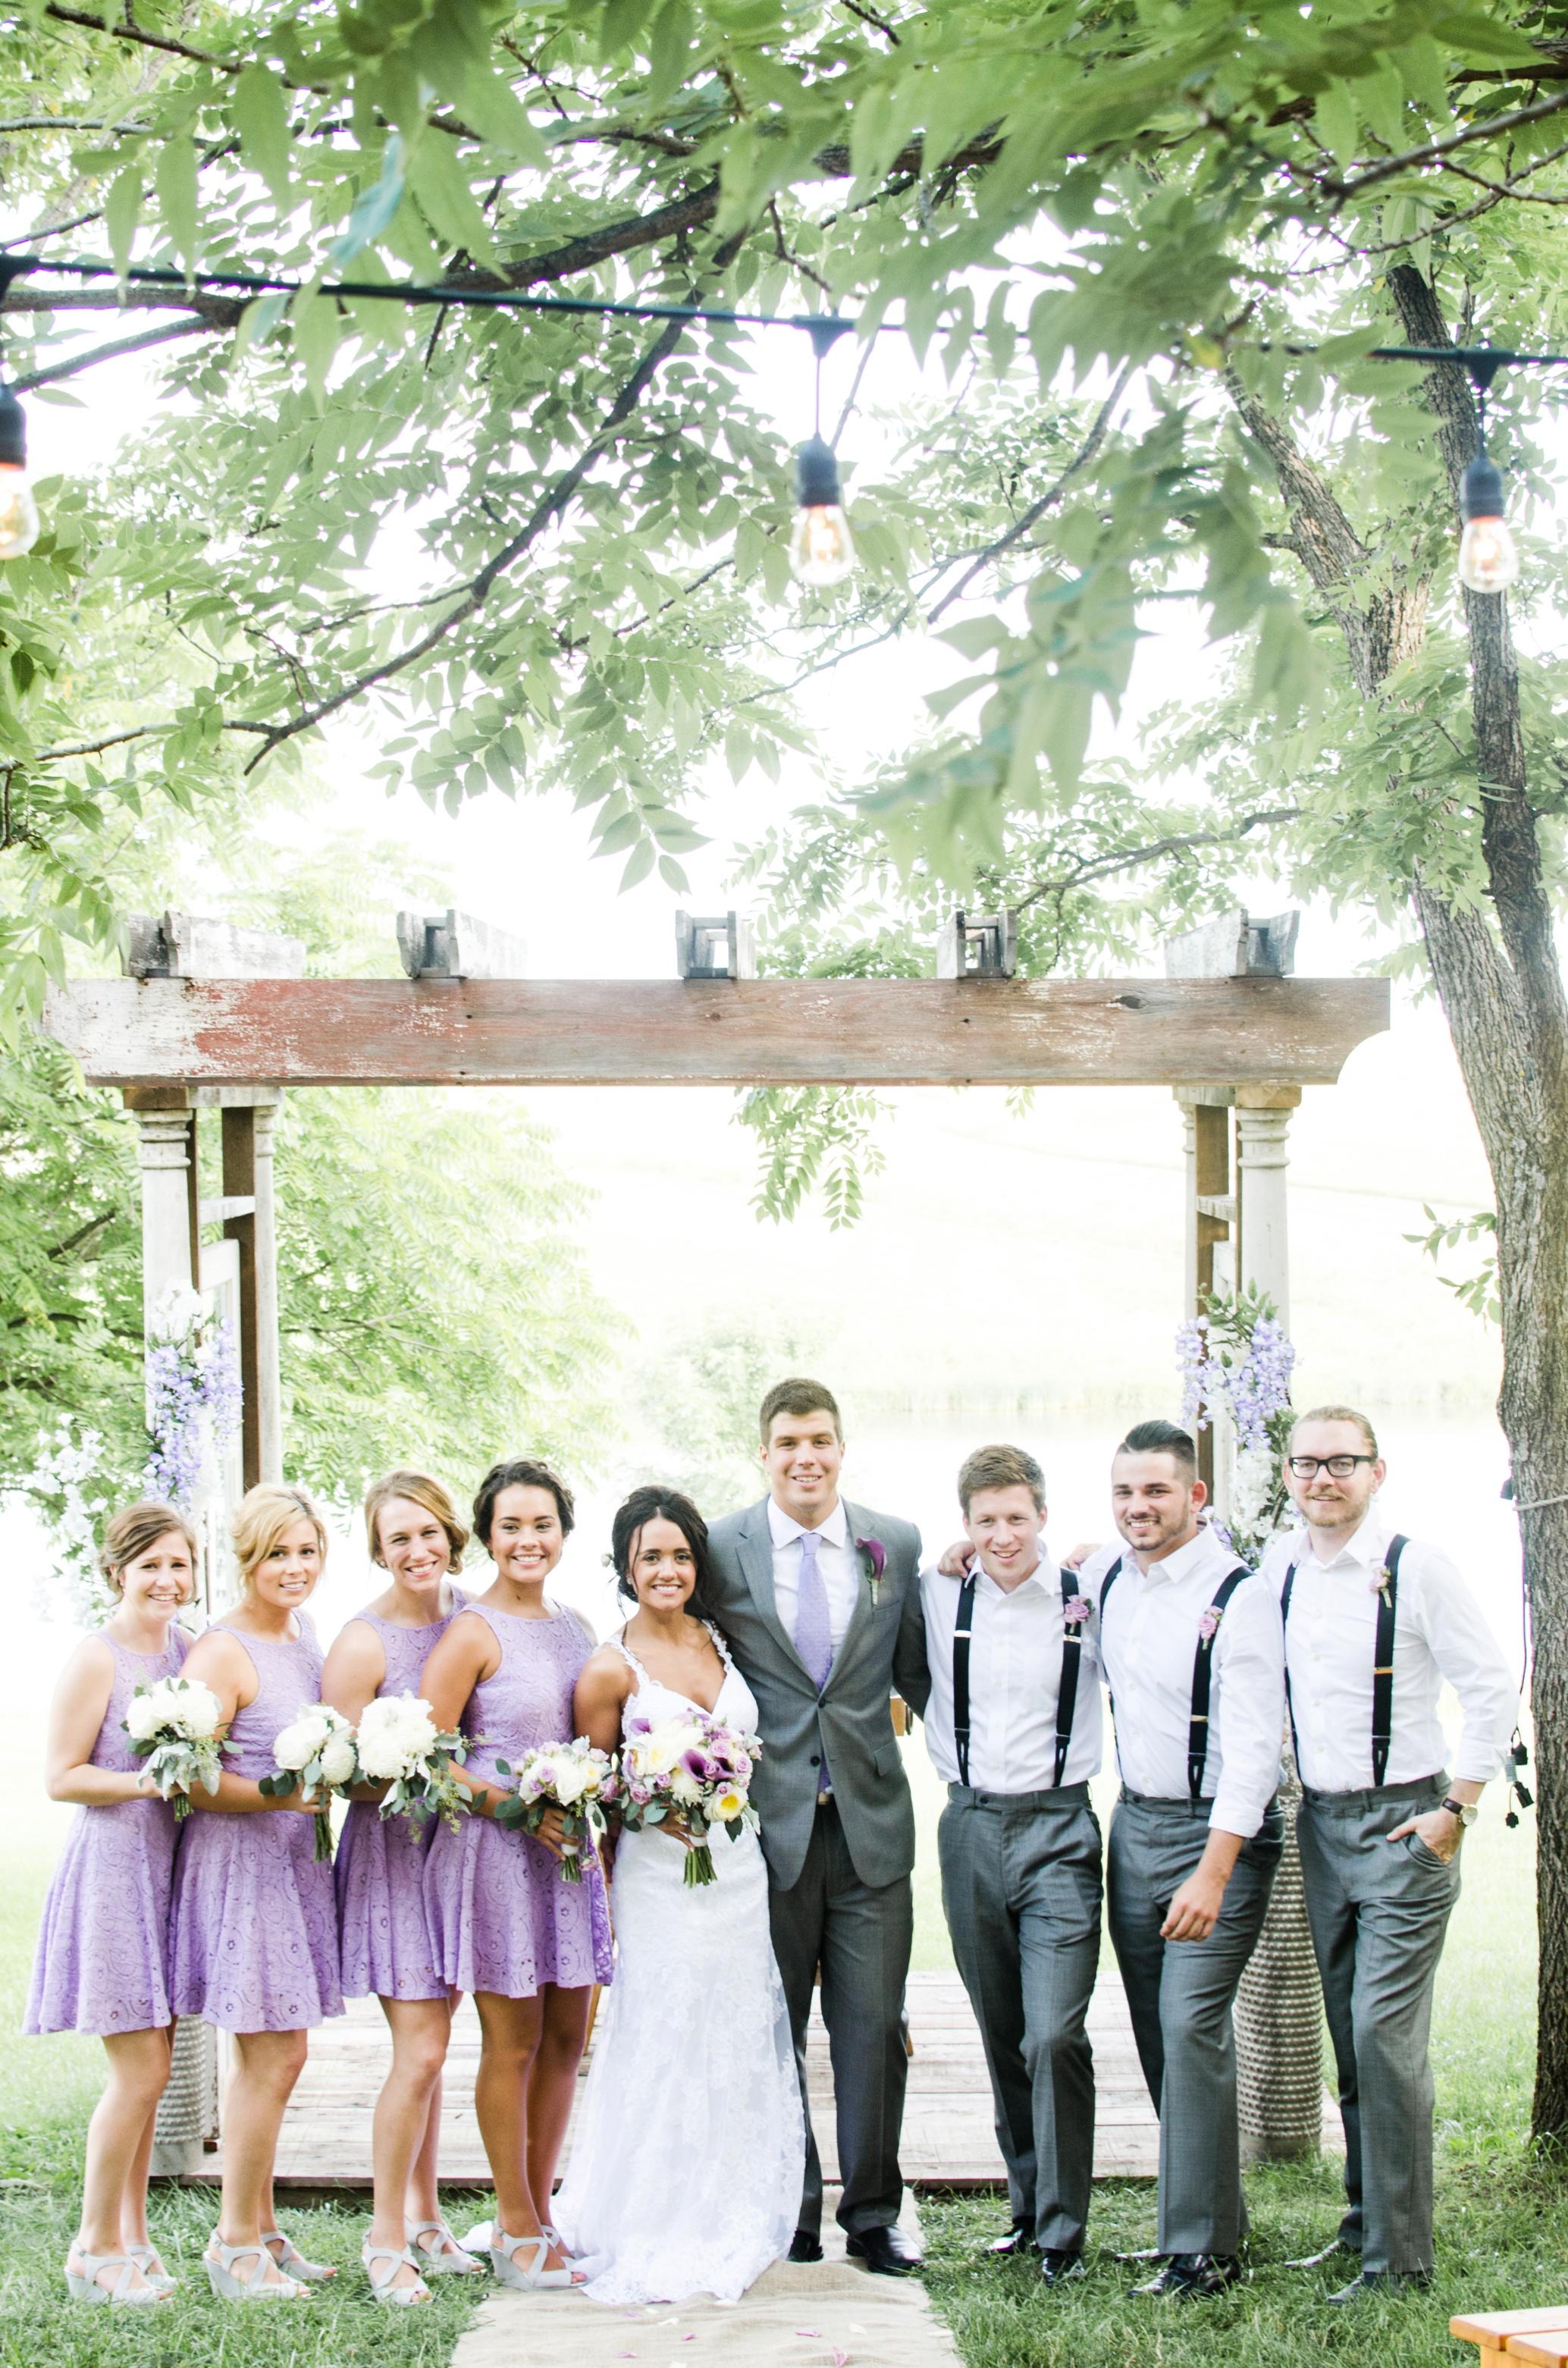 Barnes' Place Rustic Outdoor Wedding | Ali Leigh Photo Minneapolis Wedding Photographer_0139.jpg